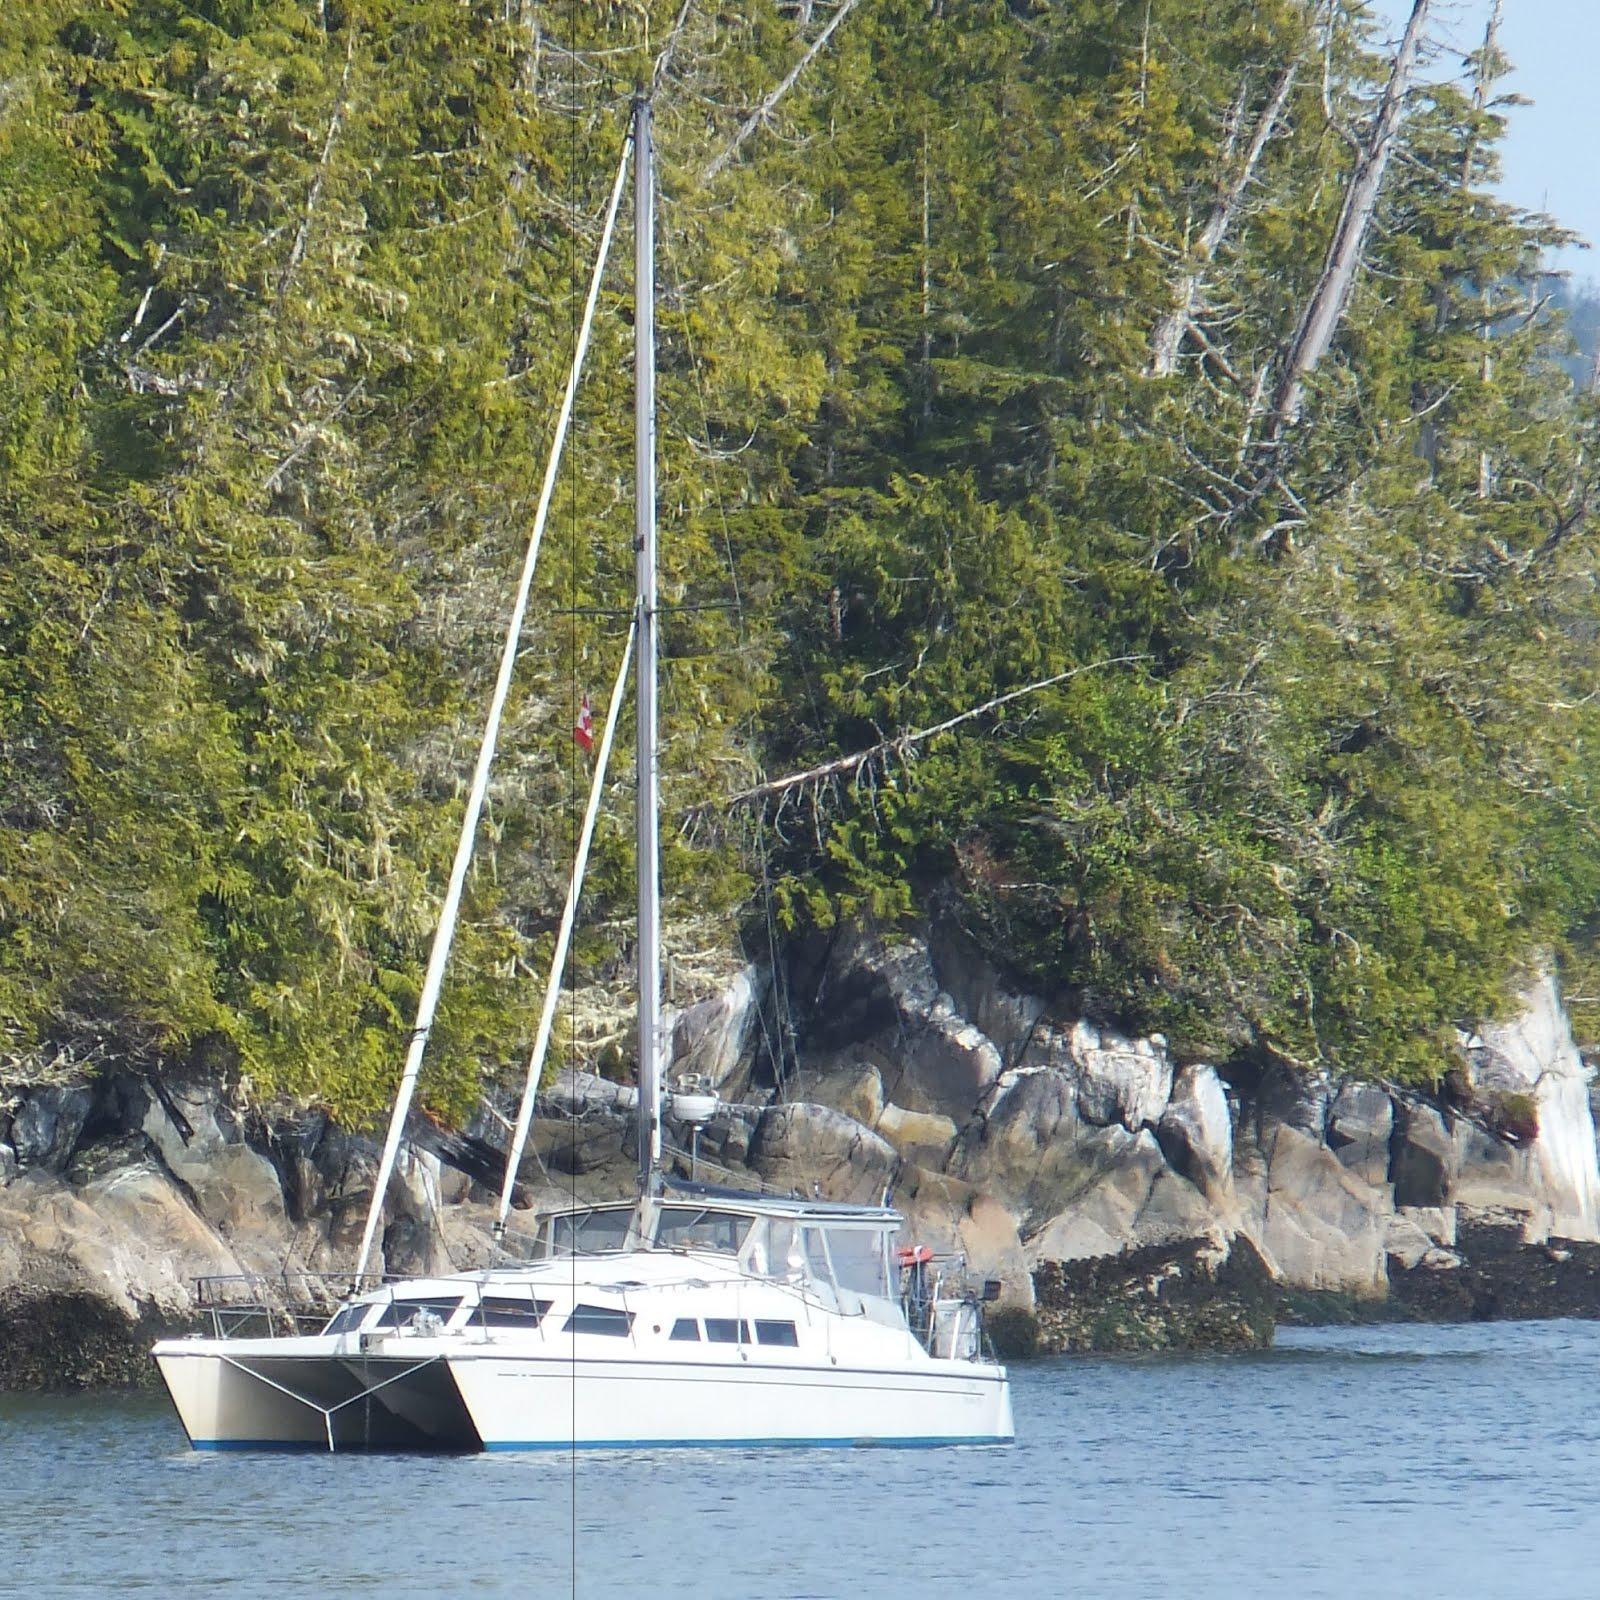 Kyrie at anchor